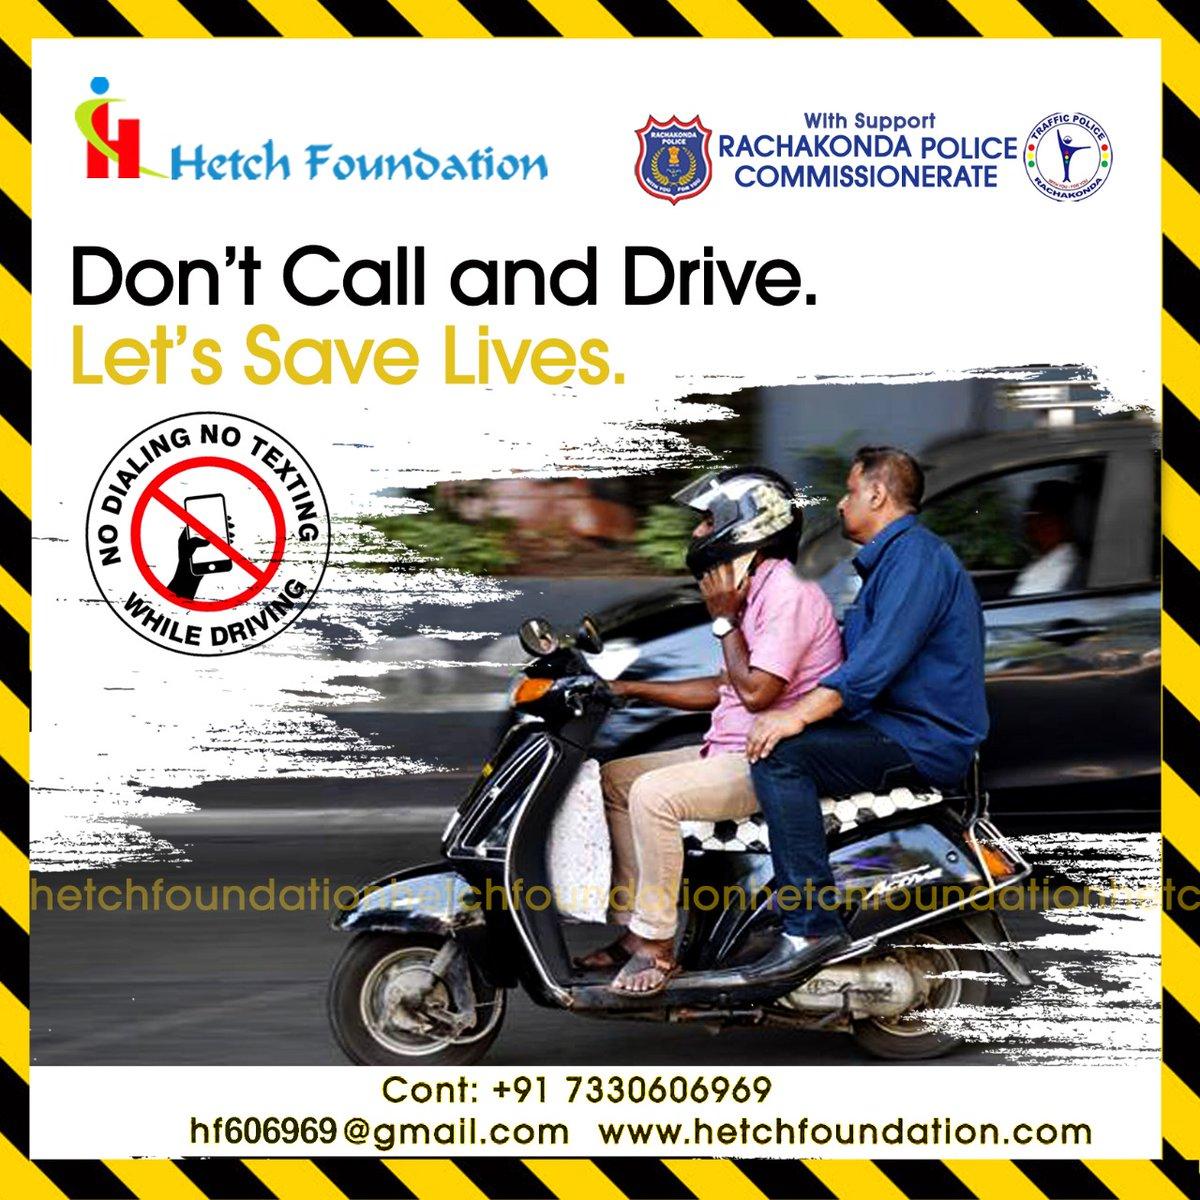 Don't Call & Driving..............! @RachakondaCop @NITIAayog  @nitin_gadkari   #RoadSafetyWeek #safetyfirst #drivesafe #accident #NoCellPhoneDriving #safedriving #roadsafetycampaign #safetytips #staysafe #drivingsafety #roadsafetyawareness #safetydriving